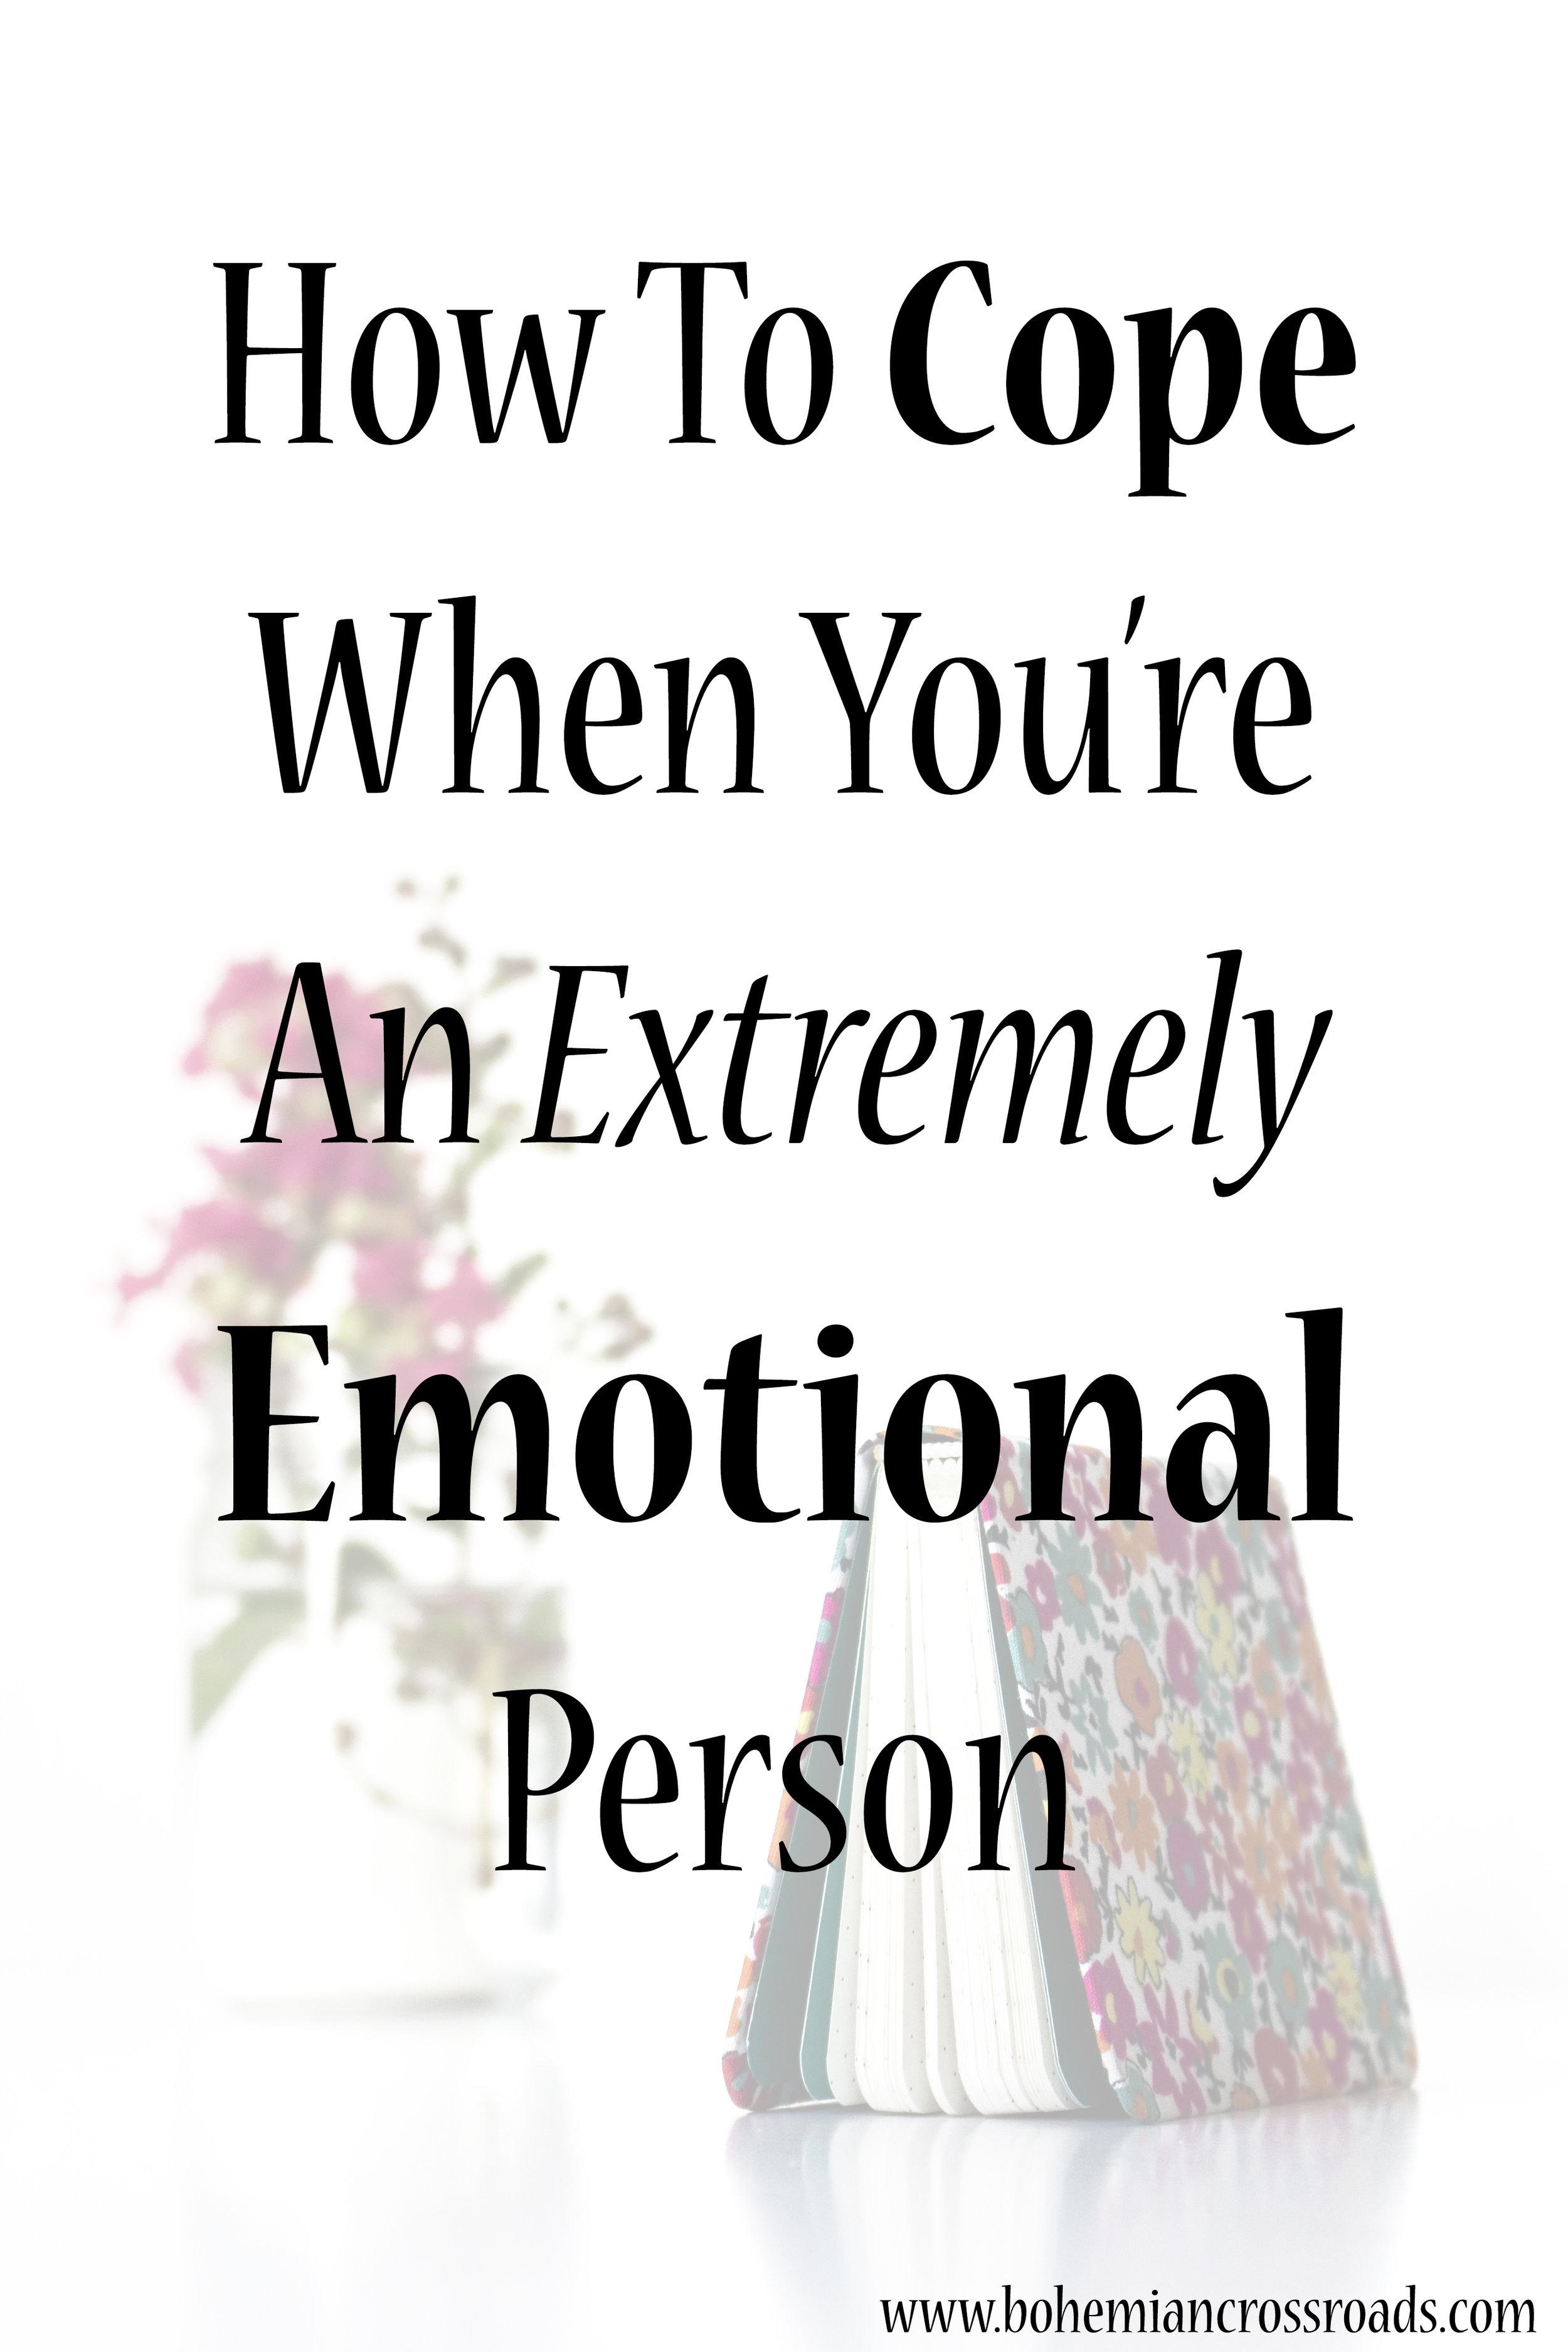 emotional-person.jpg